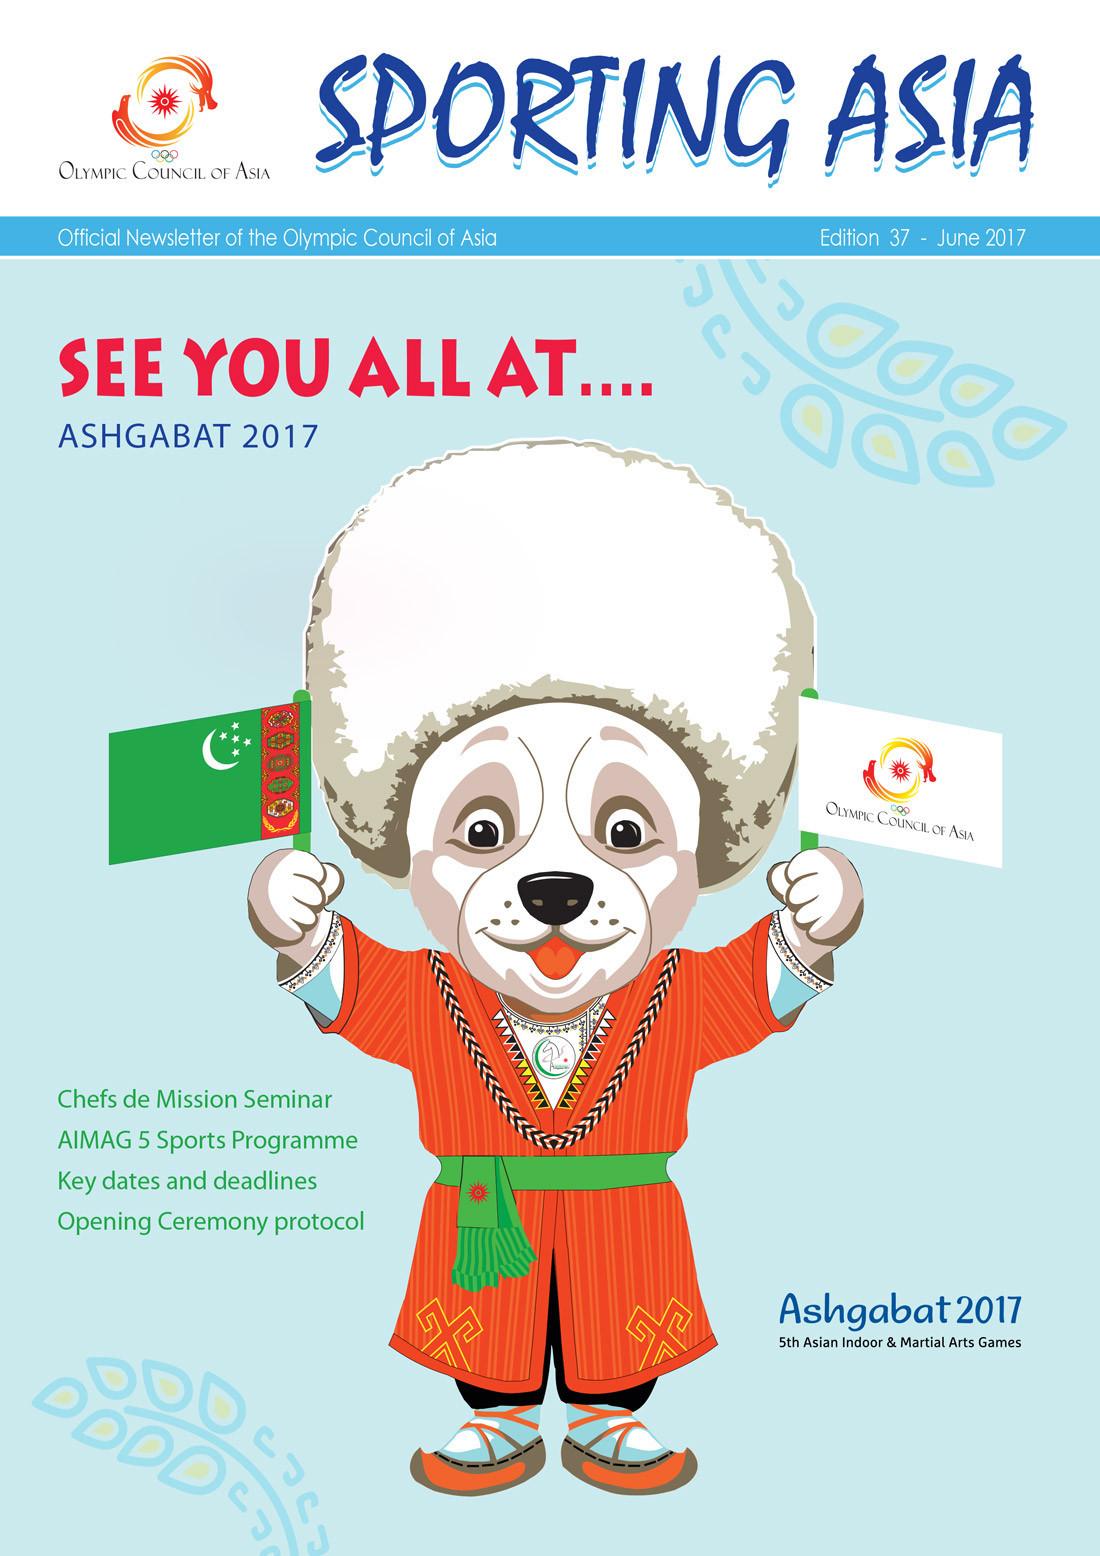 Sporting Asia - Edition 37 - JUN 2017